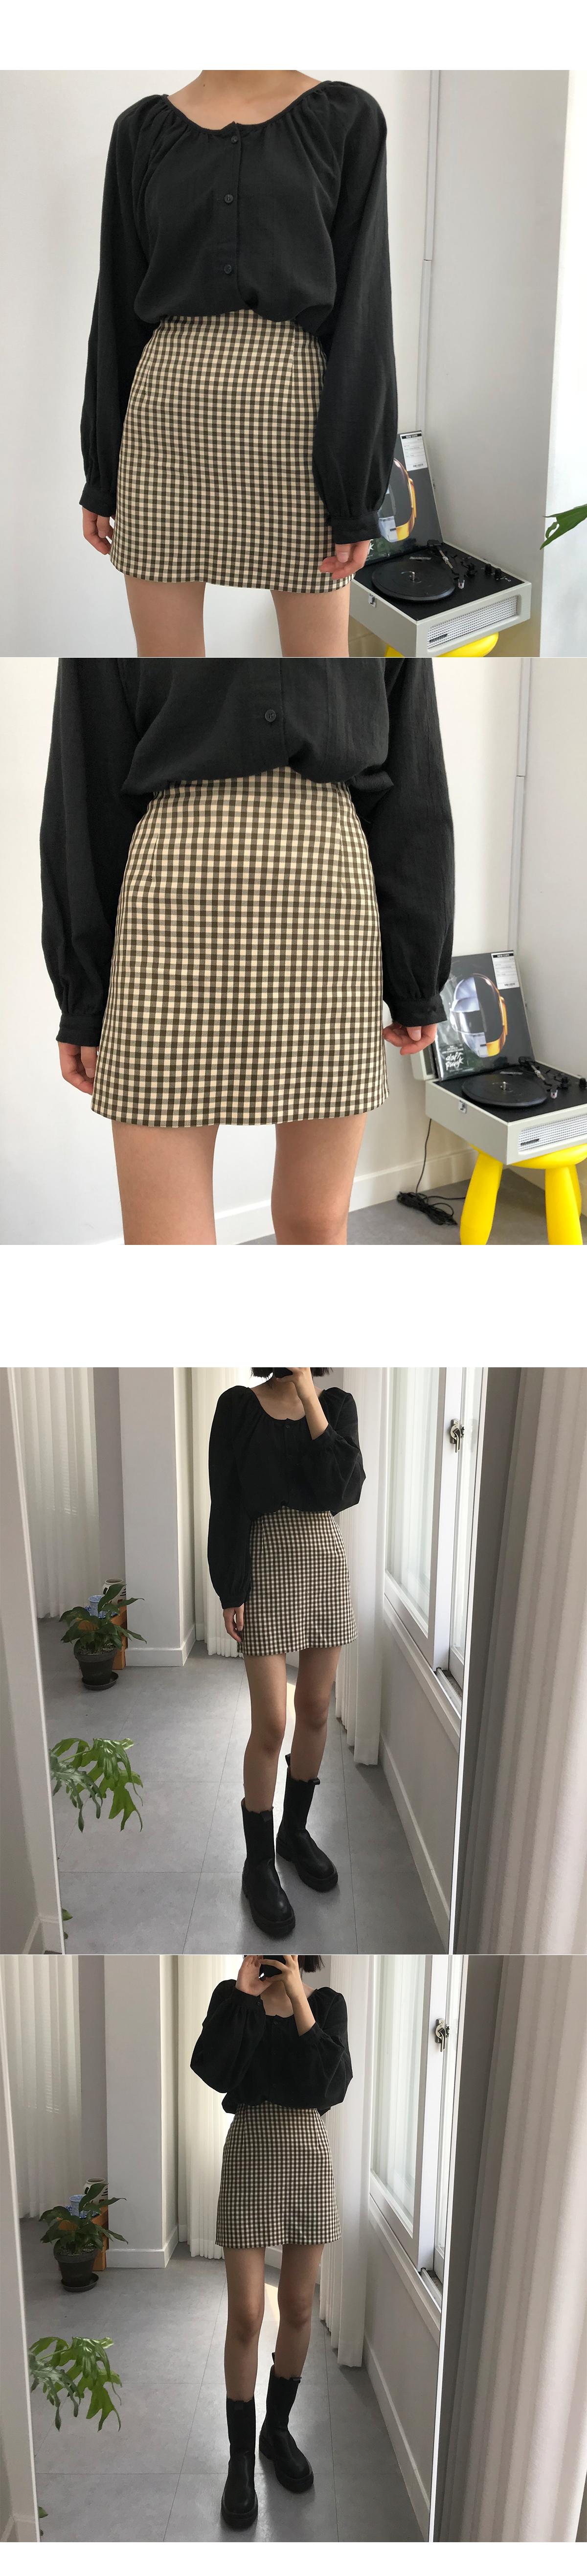 crunch check mini skirt